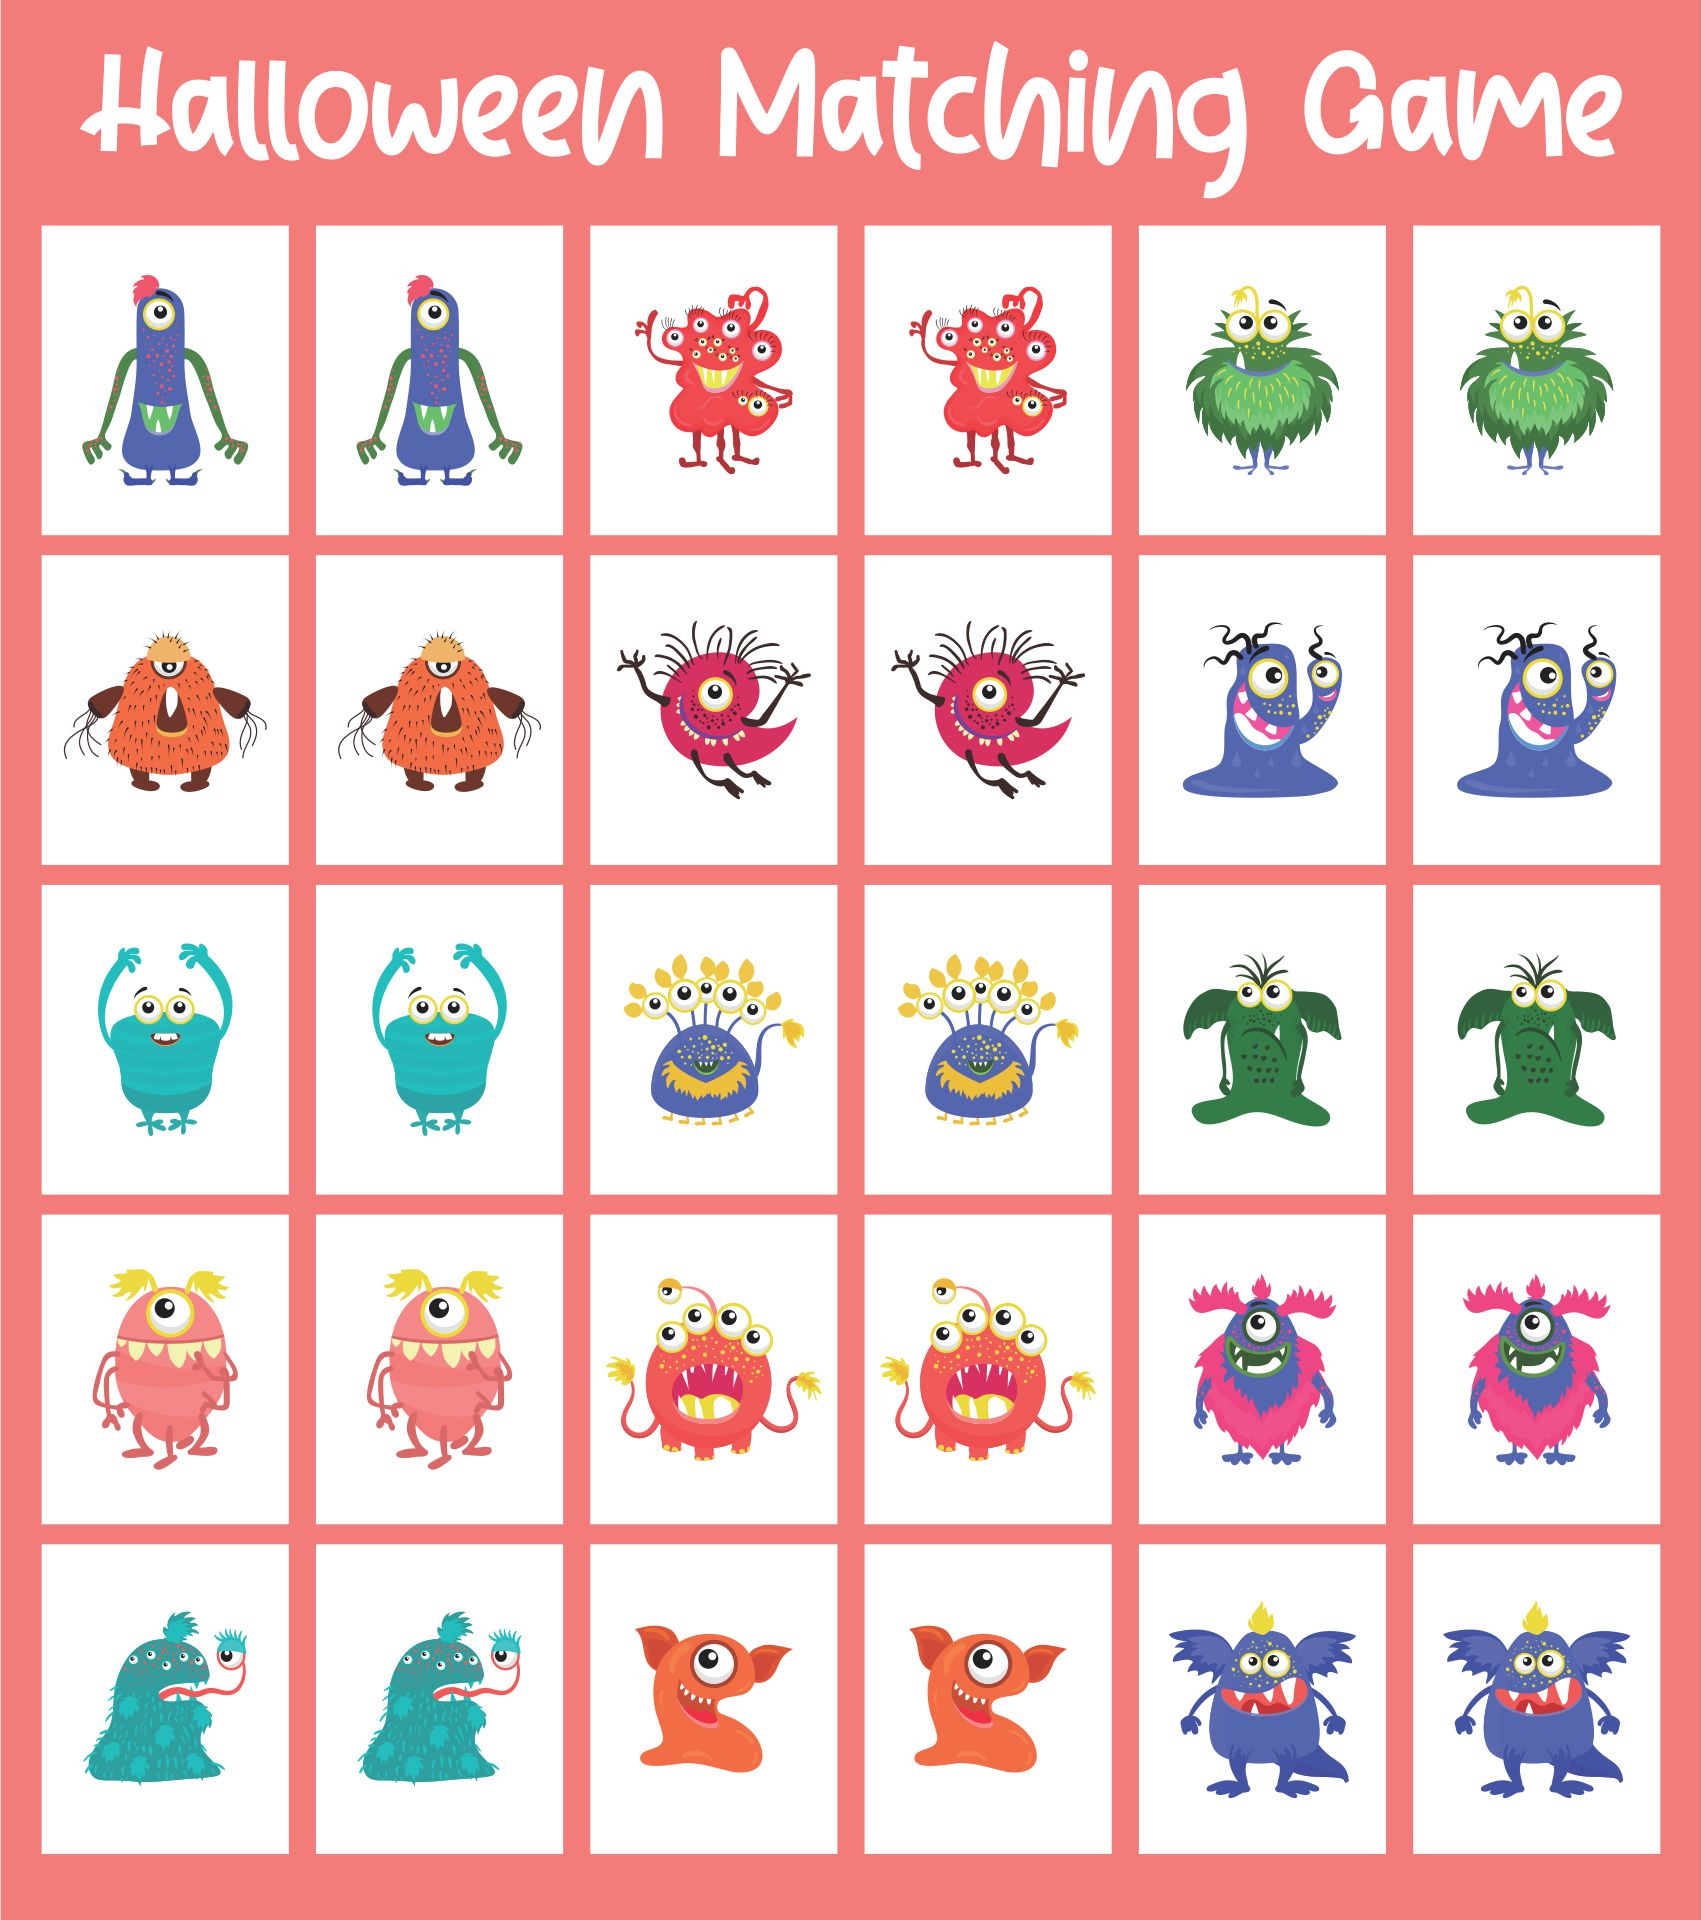 Monster-Themed Halloween Matching Game Printable